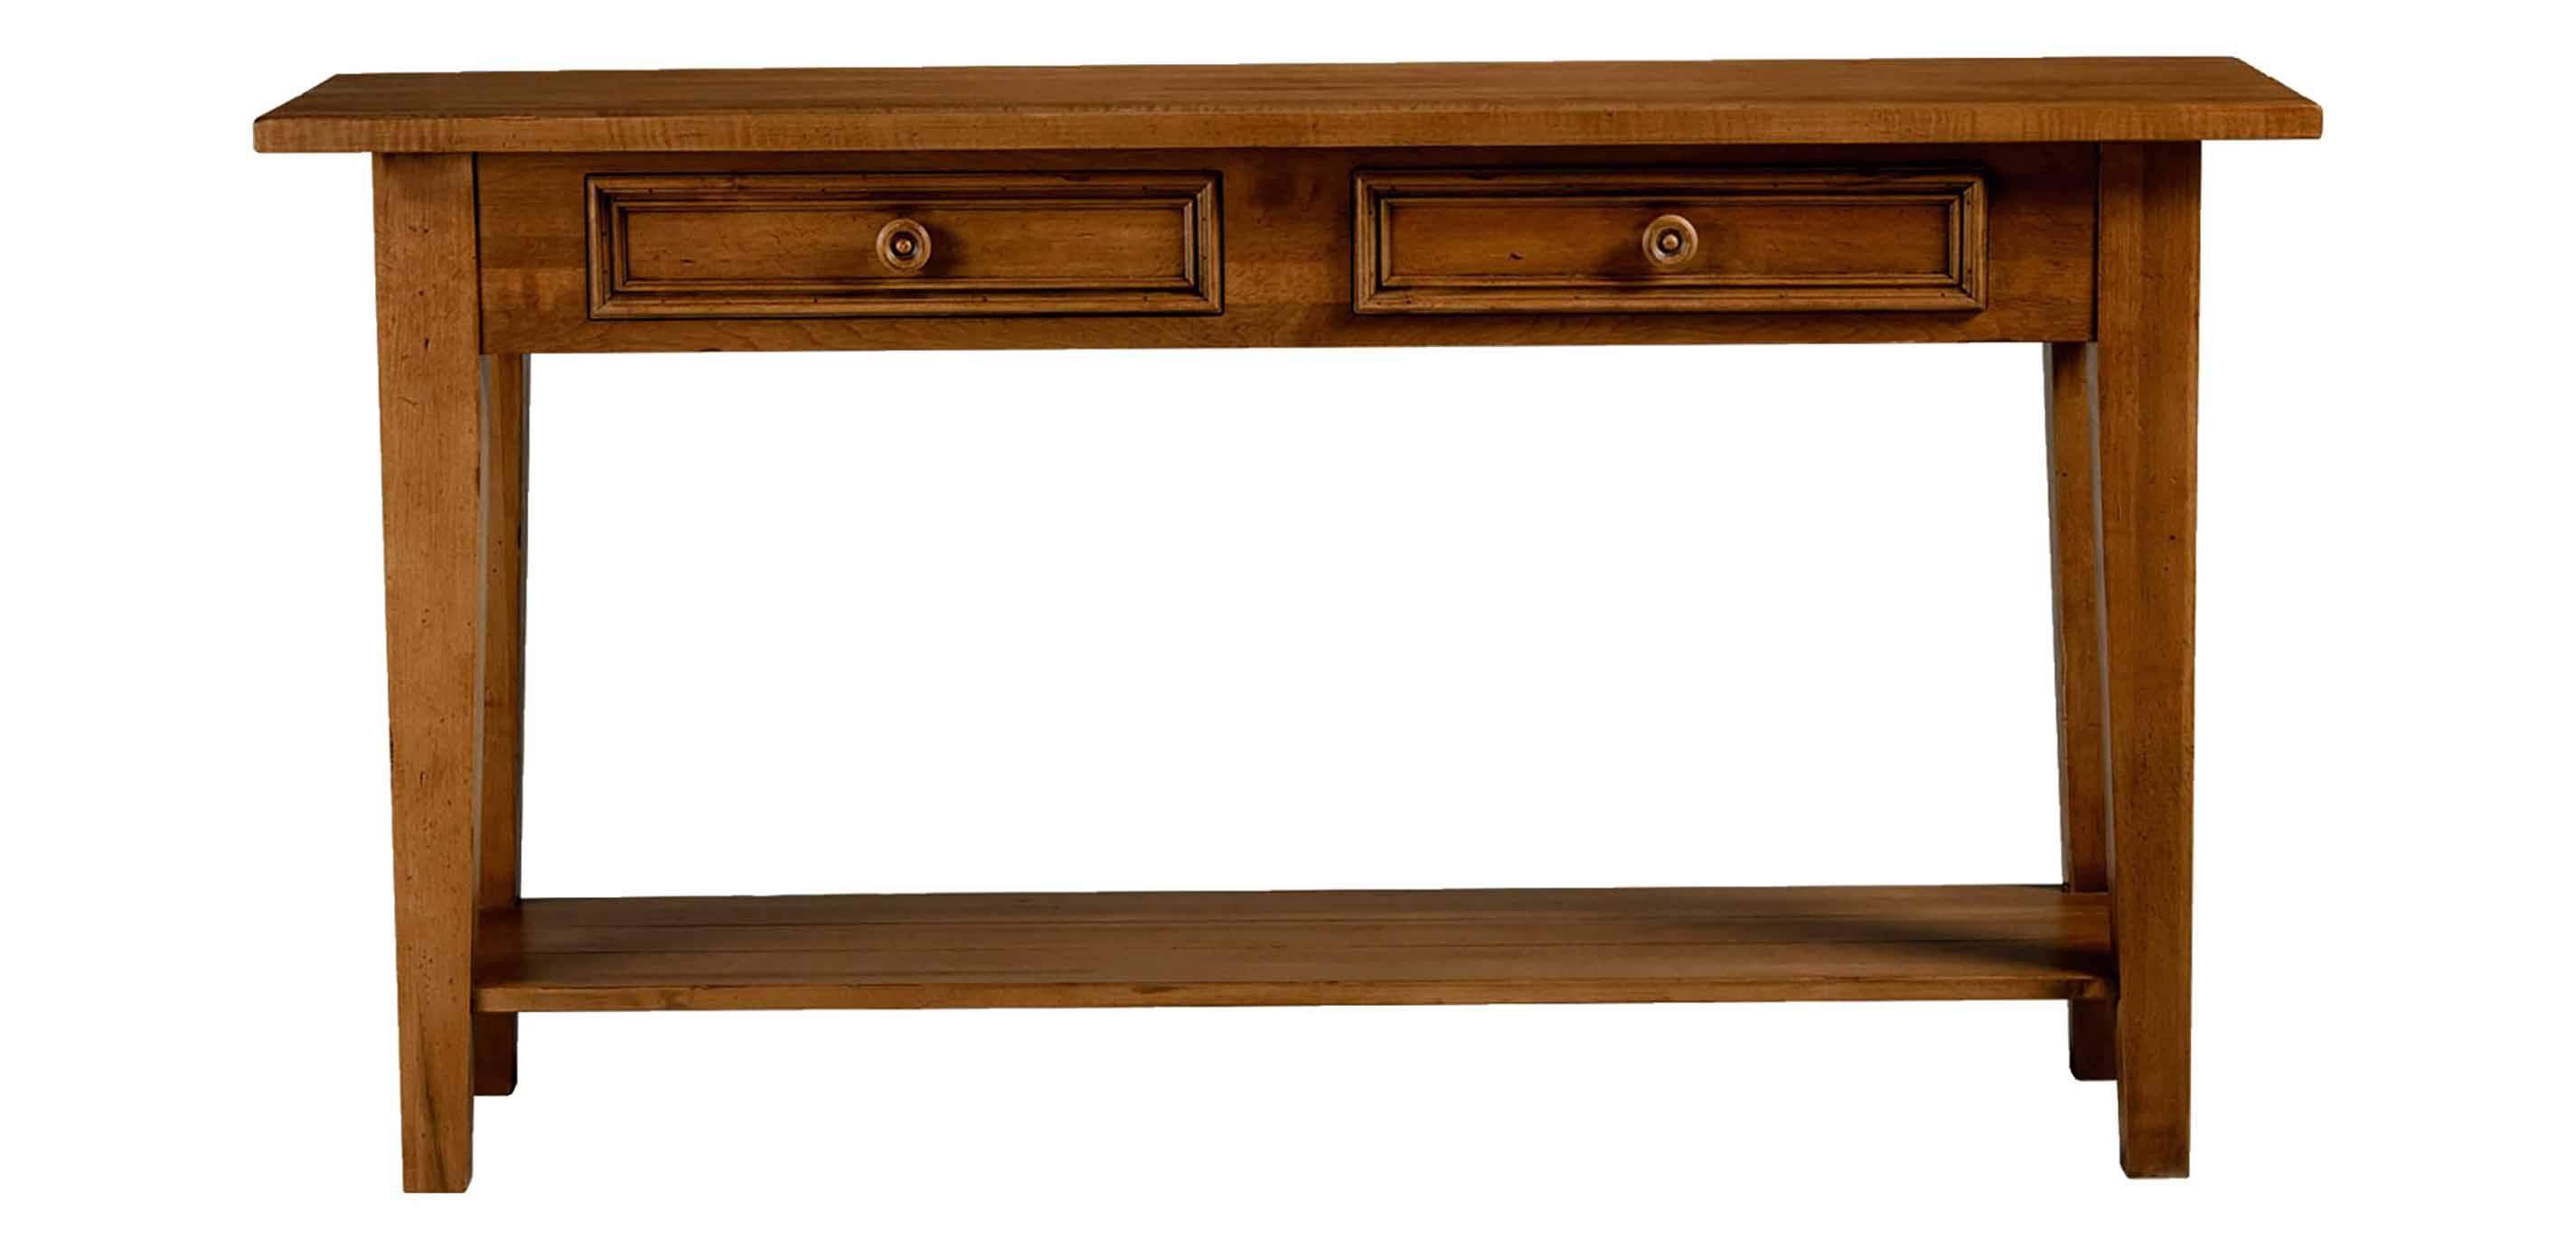 barrow sofa table modern living room leather ethan allen rueckspiegel